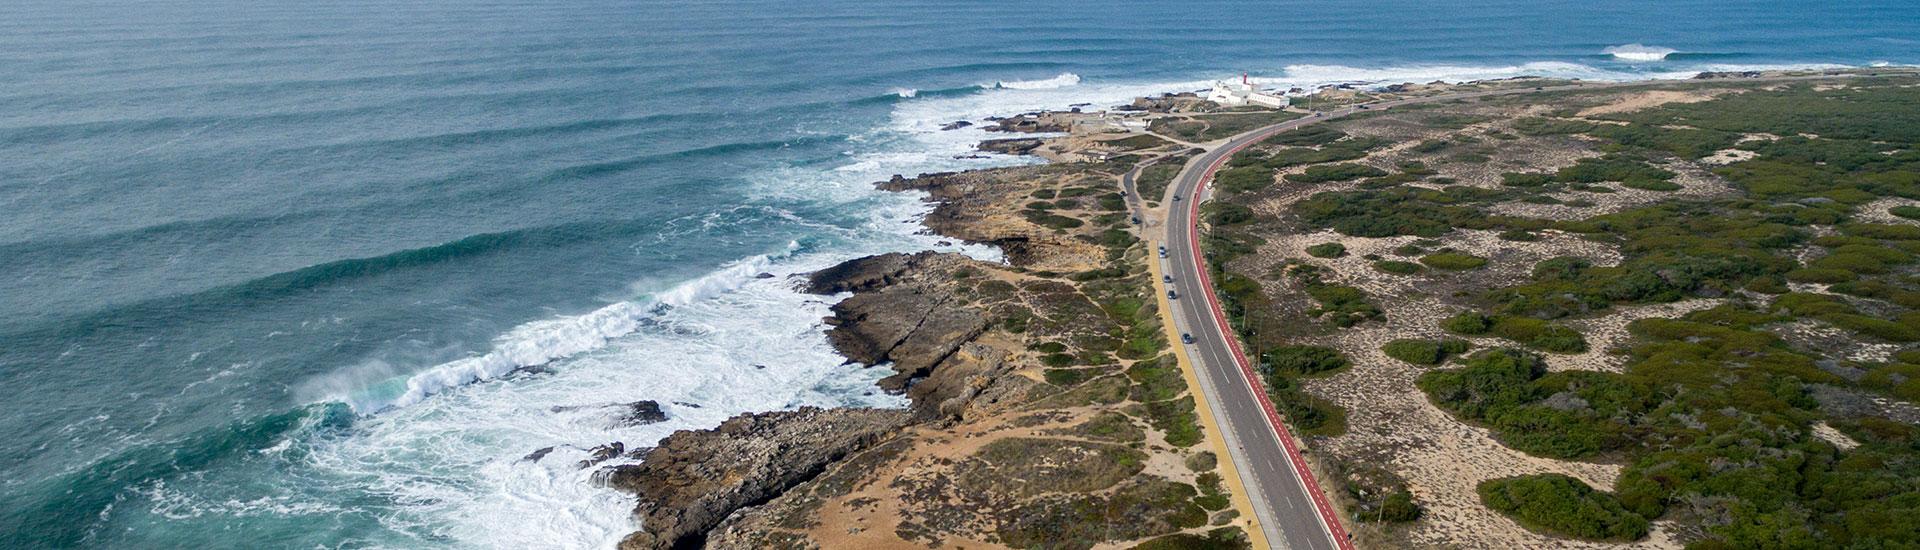 Car rentals Portugal hero